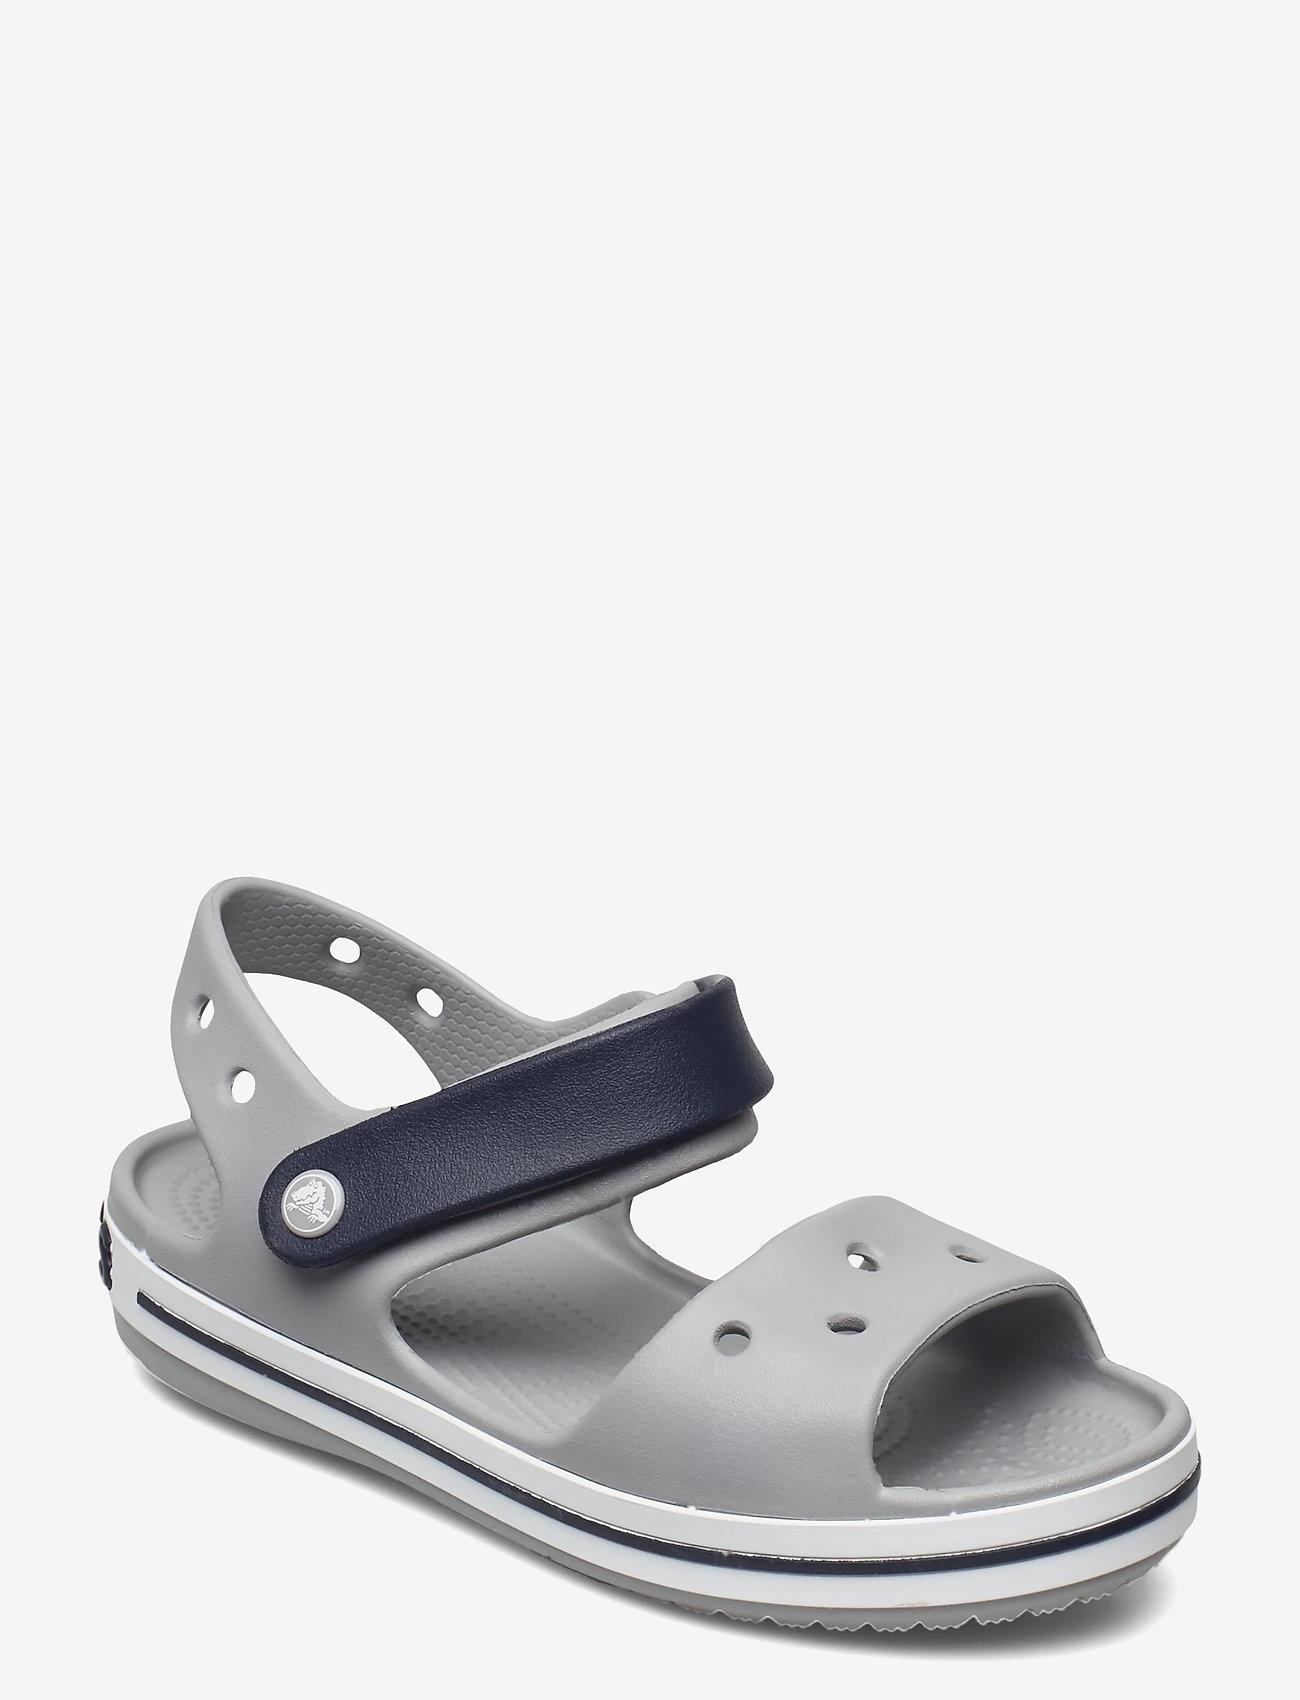 Crocs - Crocband Sandal Kids - light grey/navy - 0